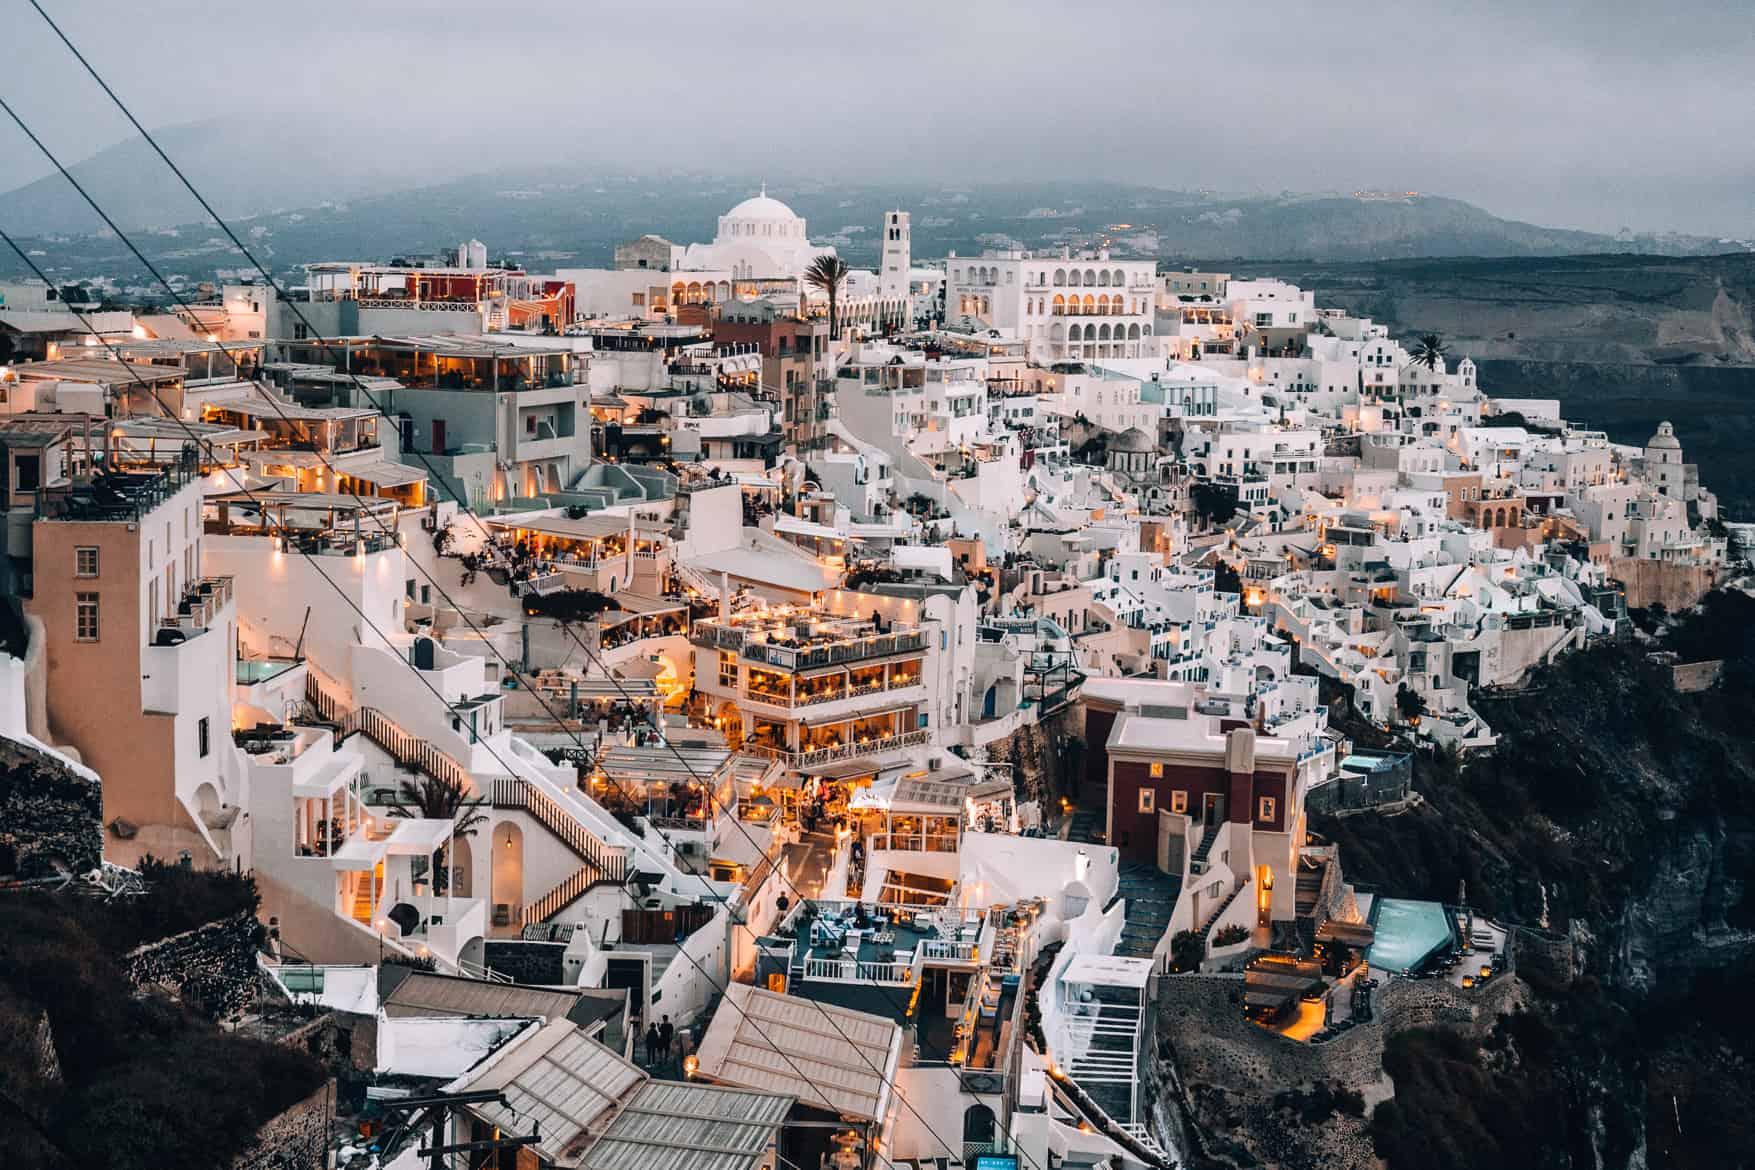 Santorini Travel Guide: Ausblick auf Fira nach Sonnenuntergang